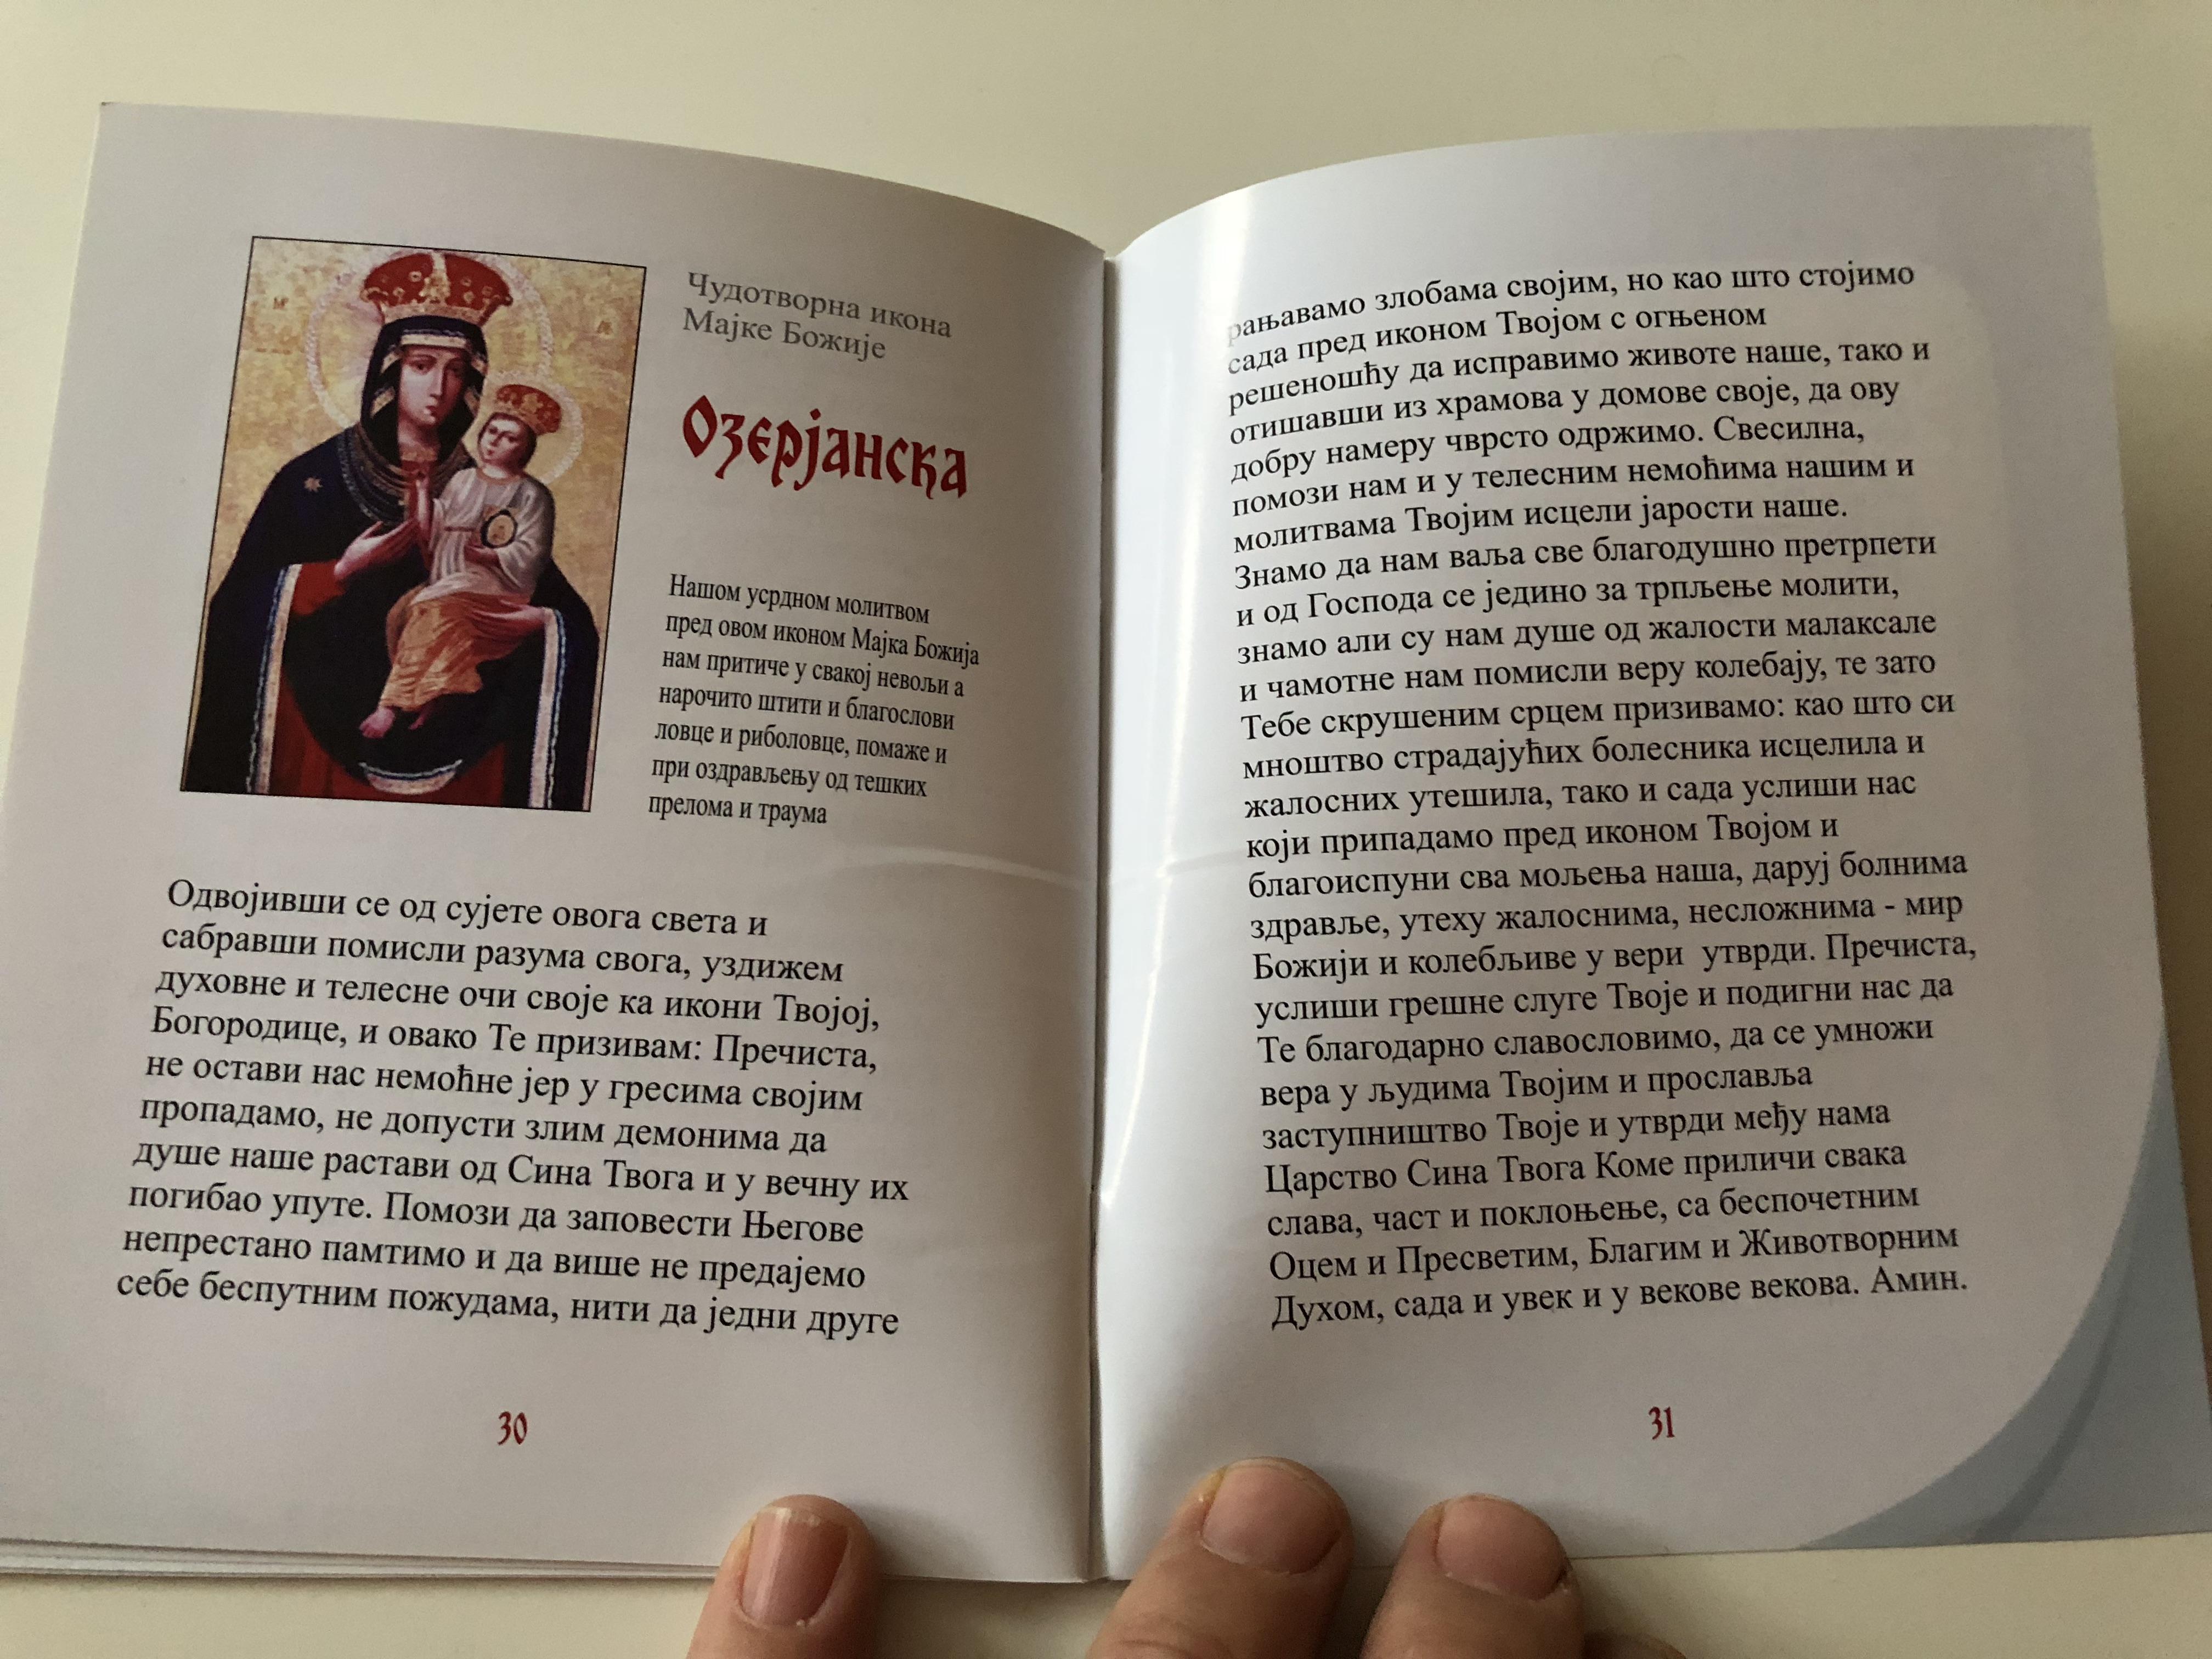 serbian-orthodox-prayer-booklet-blue-4-9-.jpg